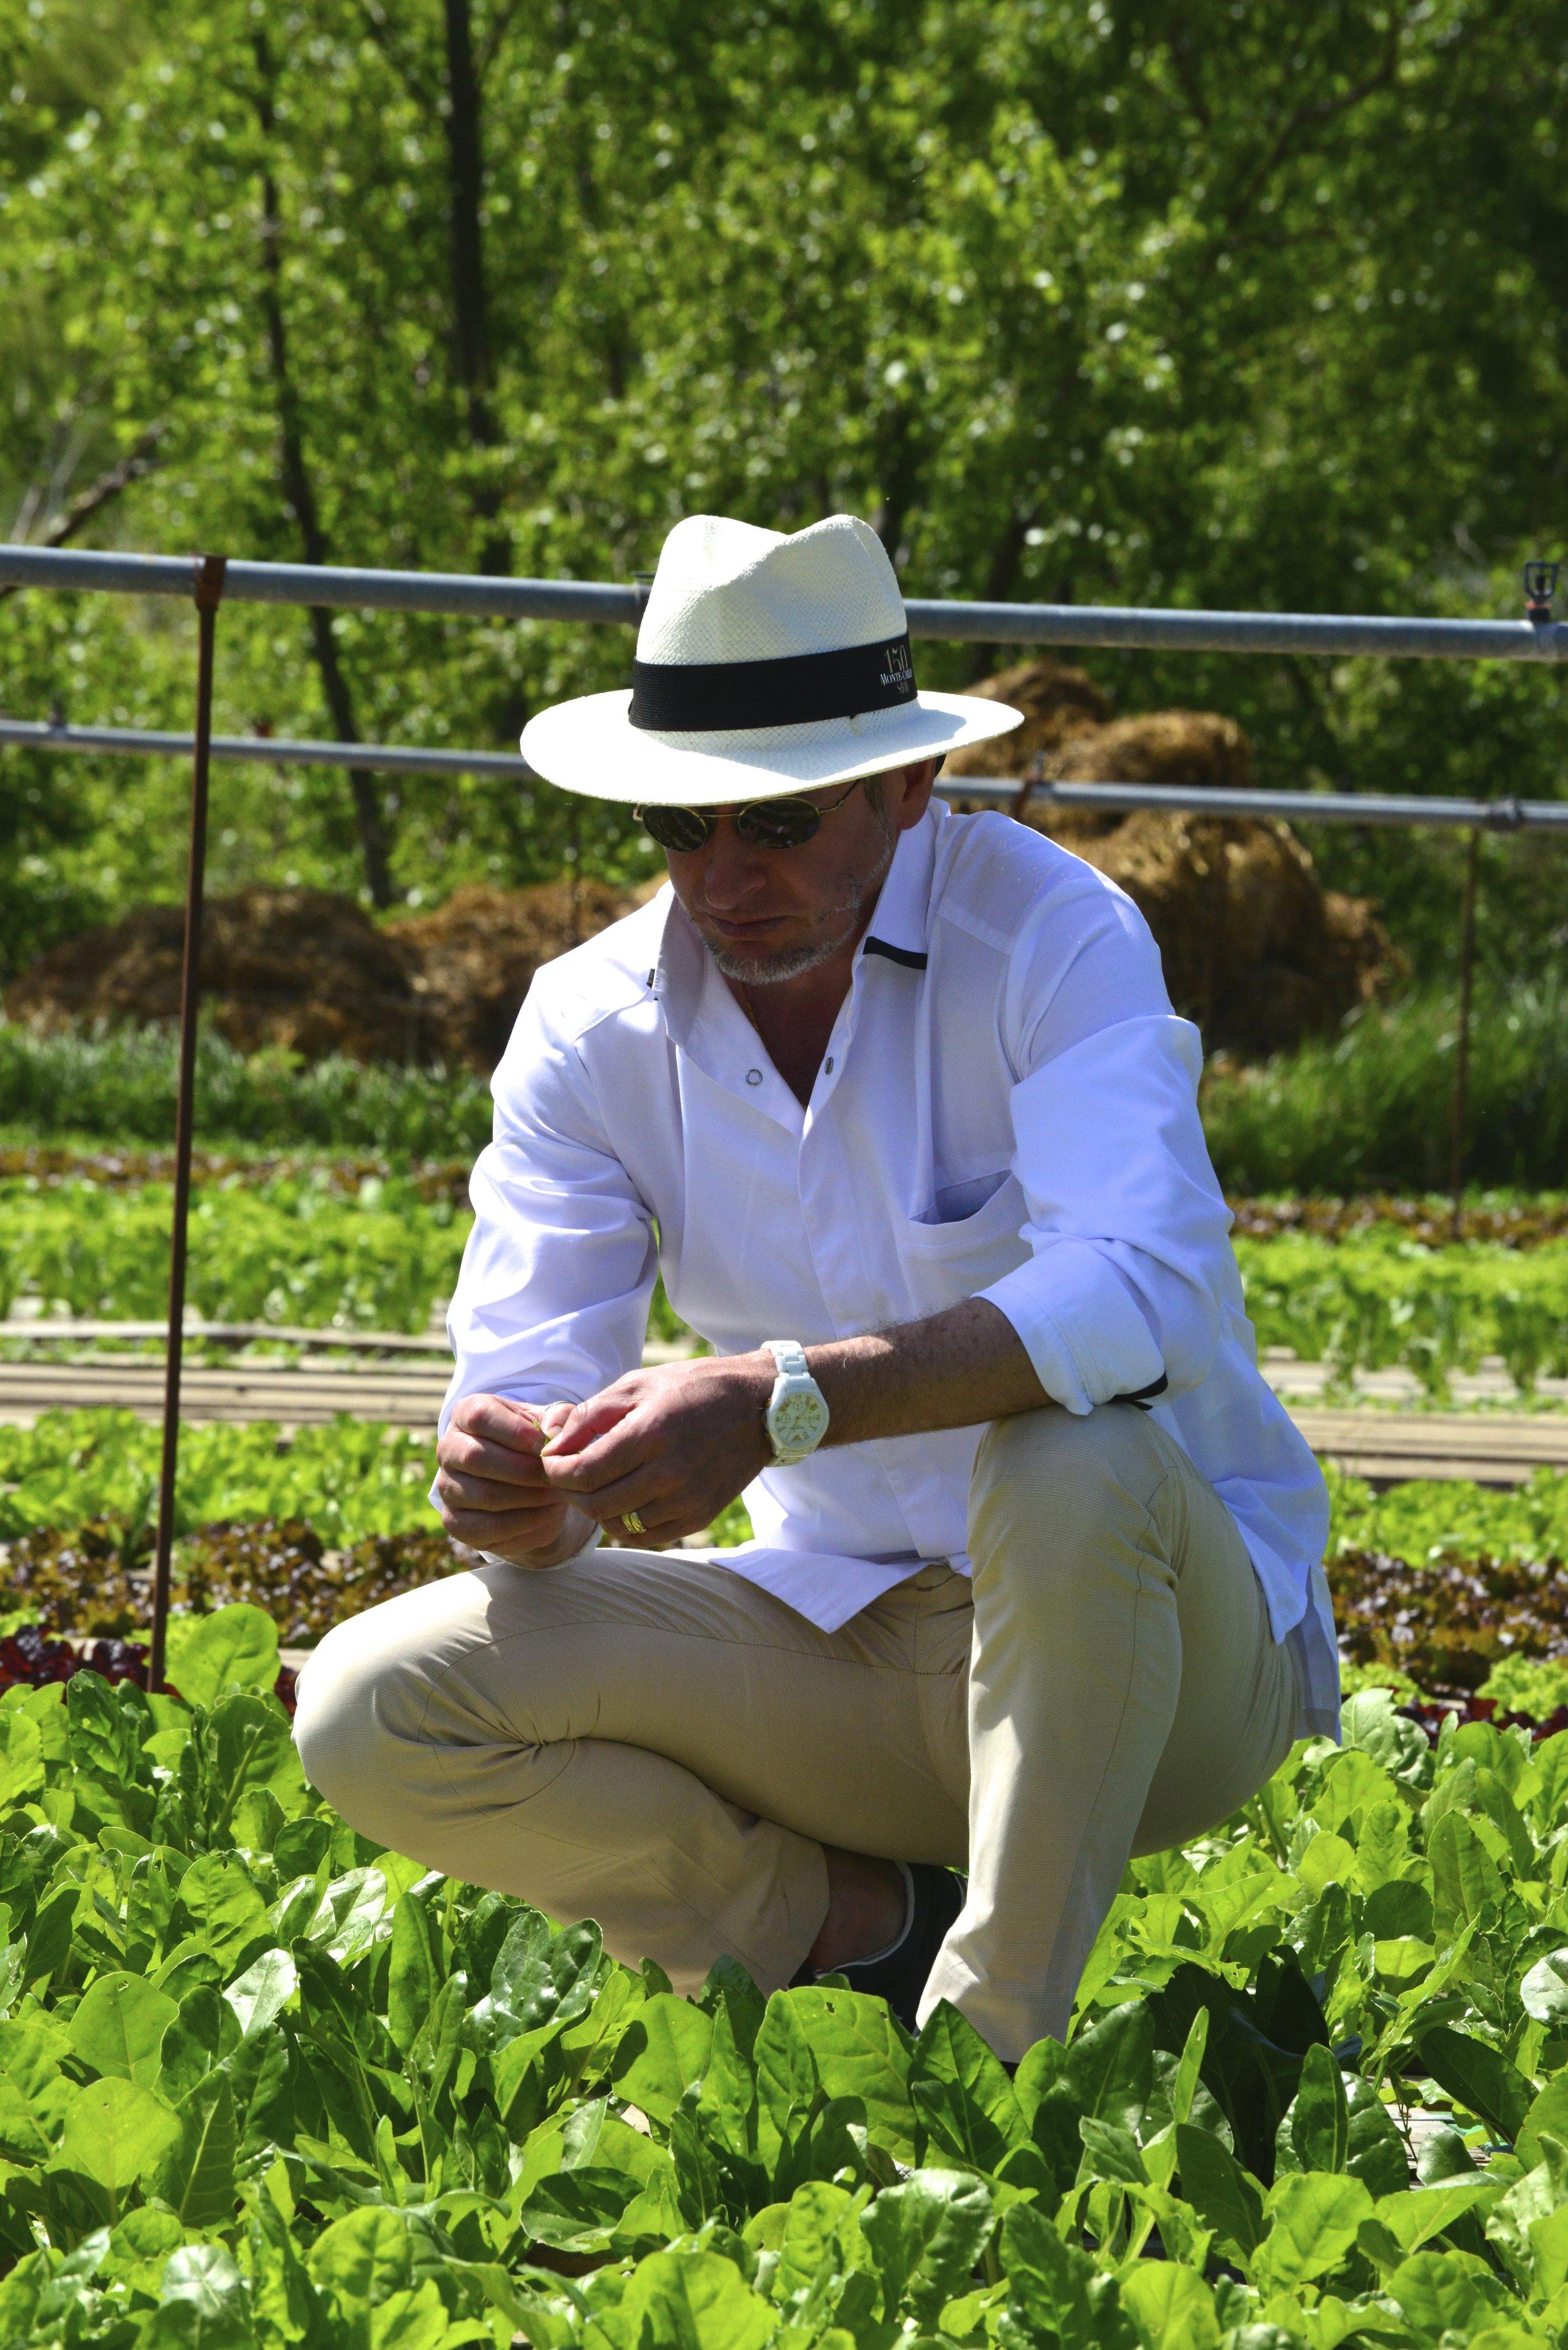 Cultiver son jardin pour mieux comprendre la Nature @TheBioChef